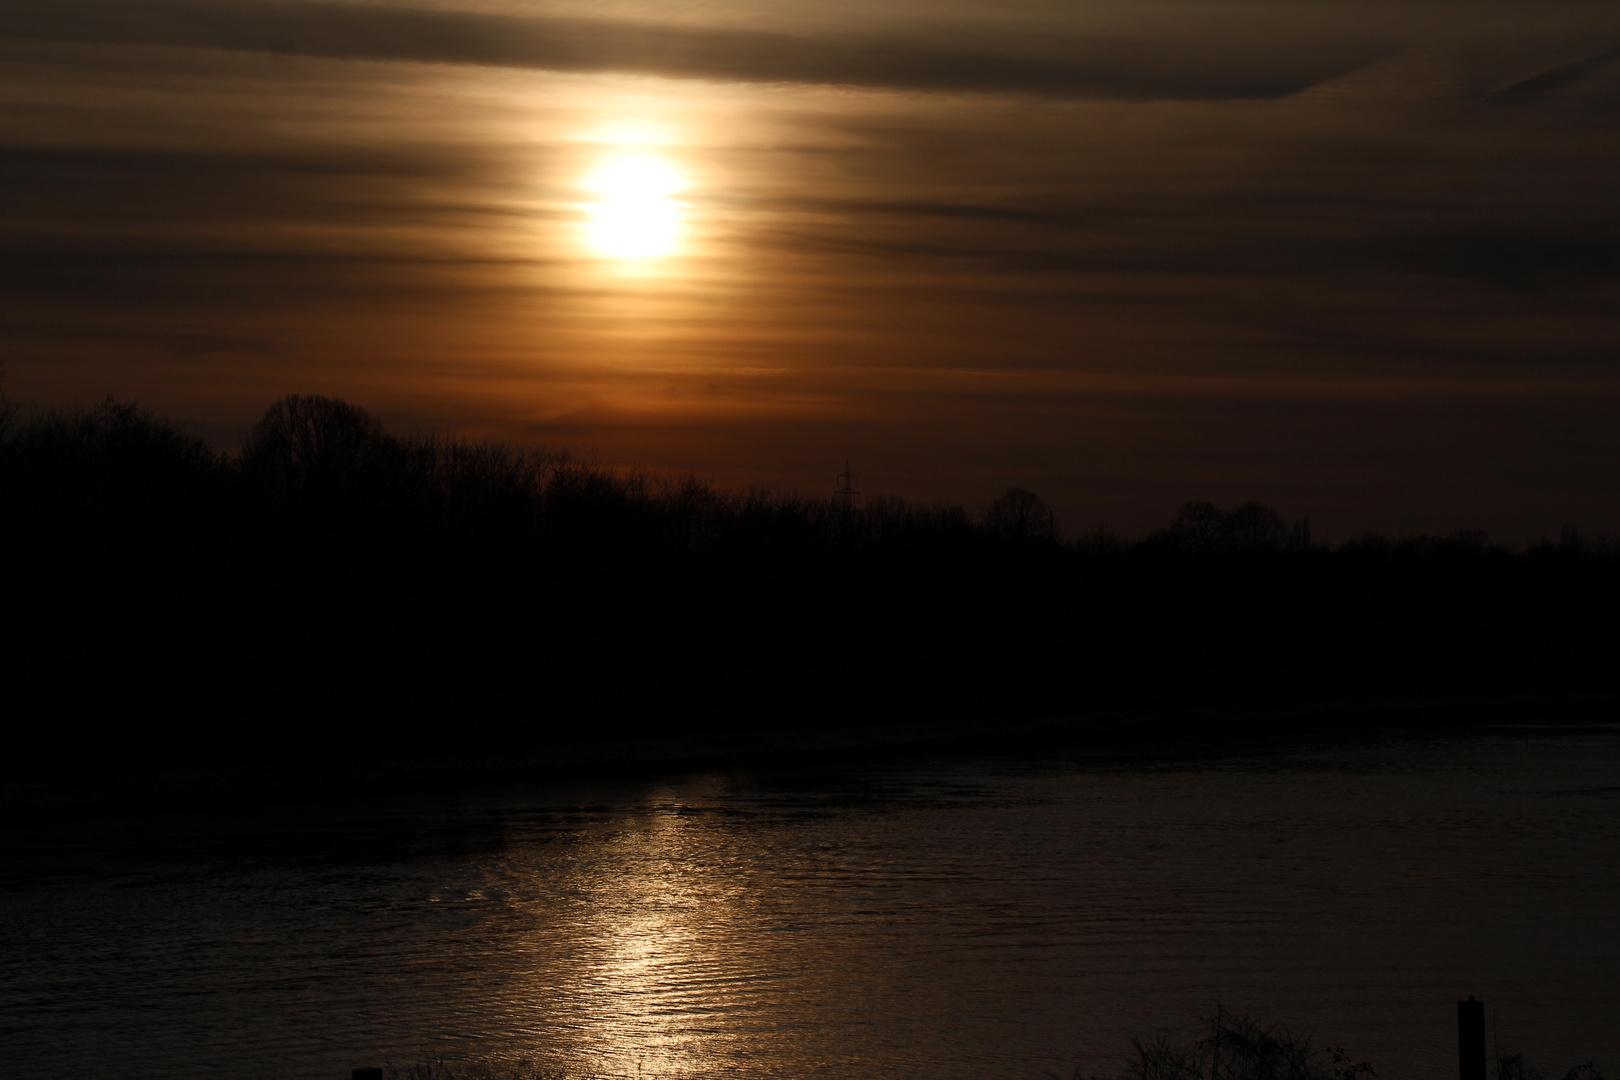 Nix Malediven-Rhein Herne Kanal :-)